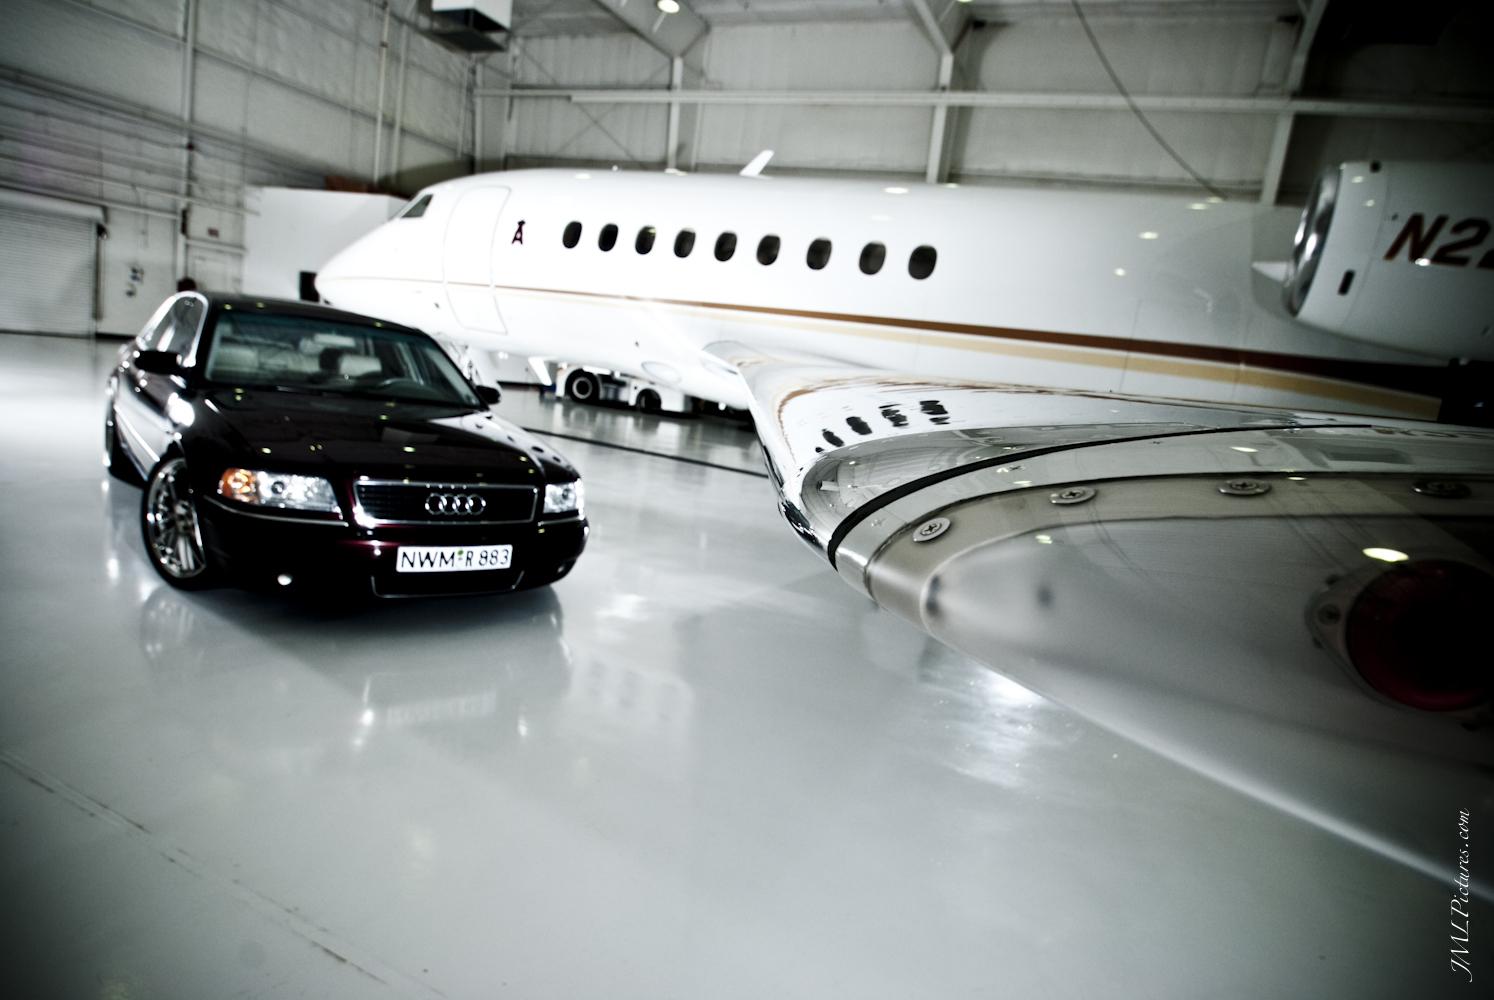 Executive/VIP